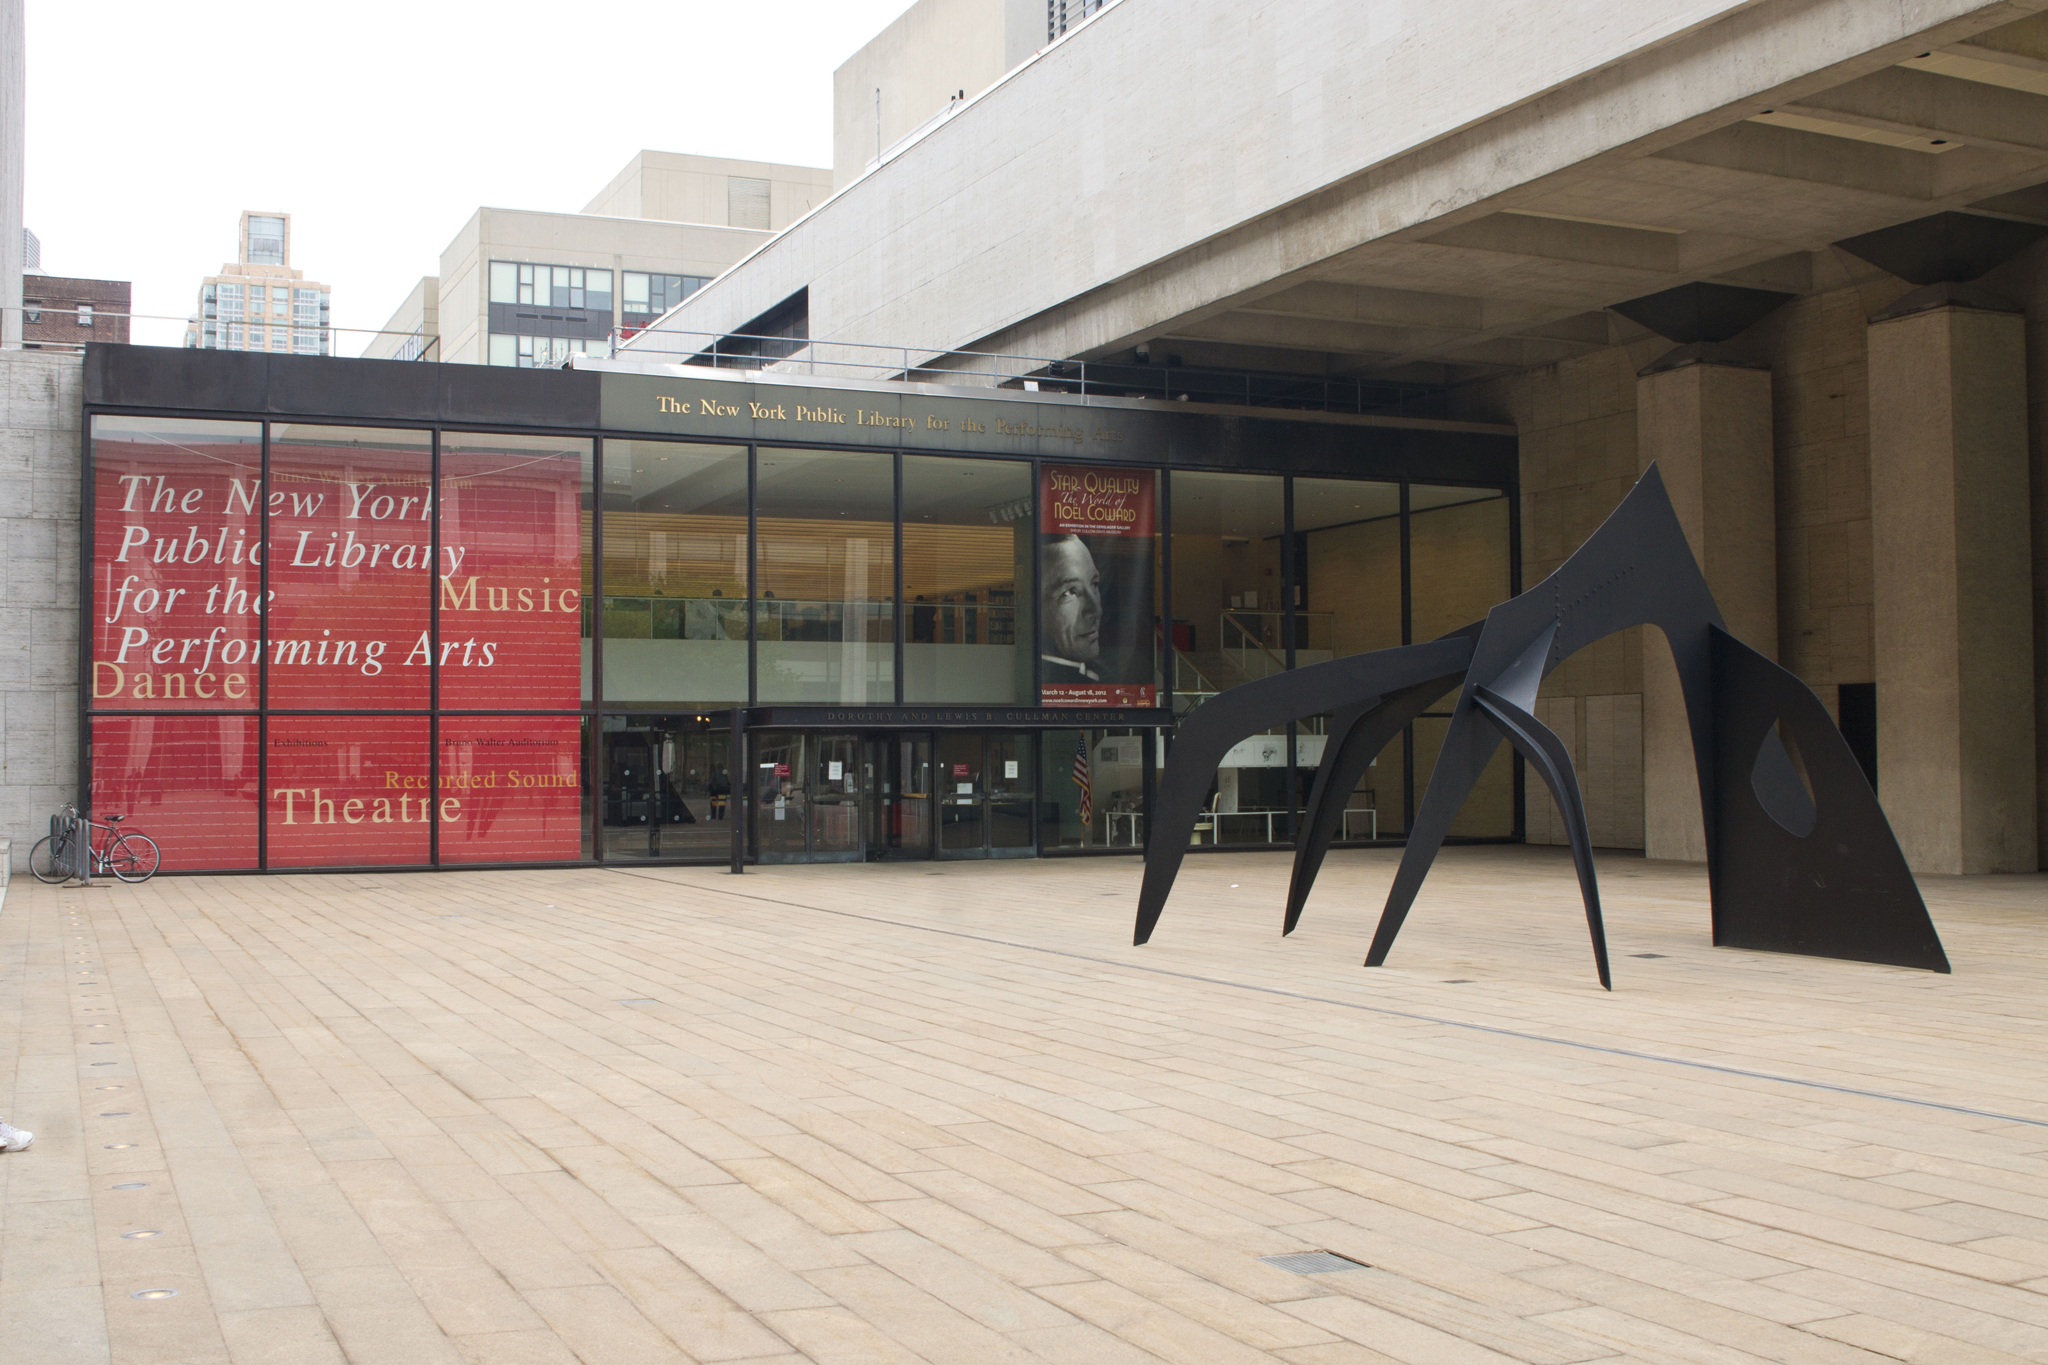 Nypl Performing Arts Exhibits